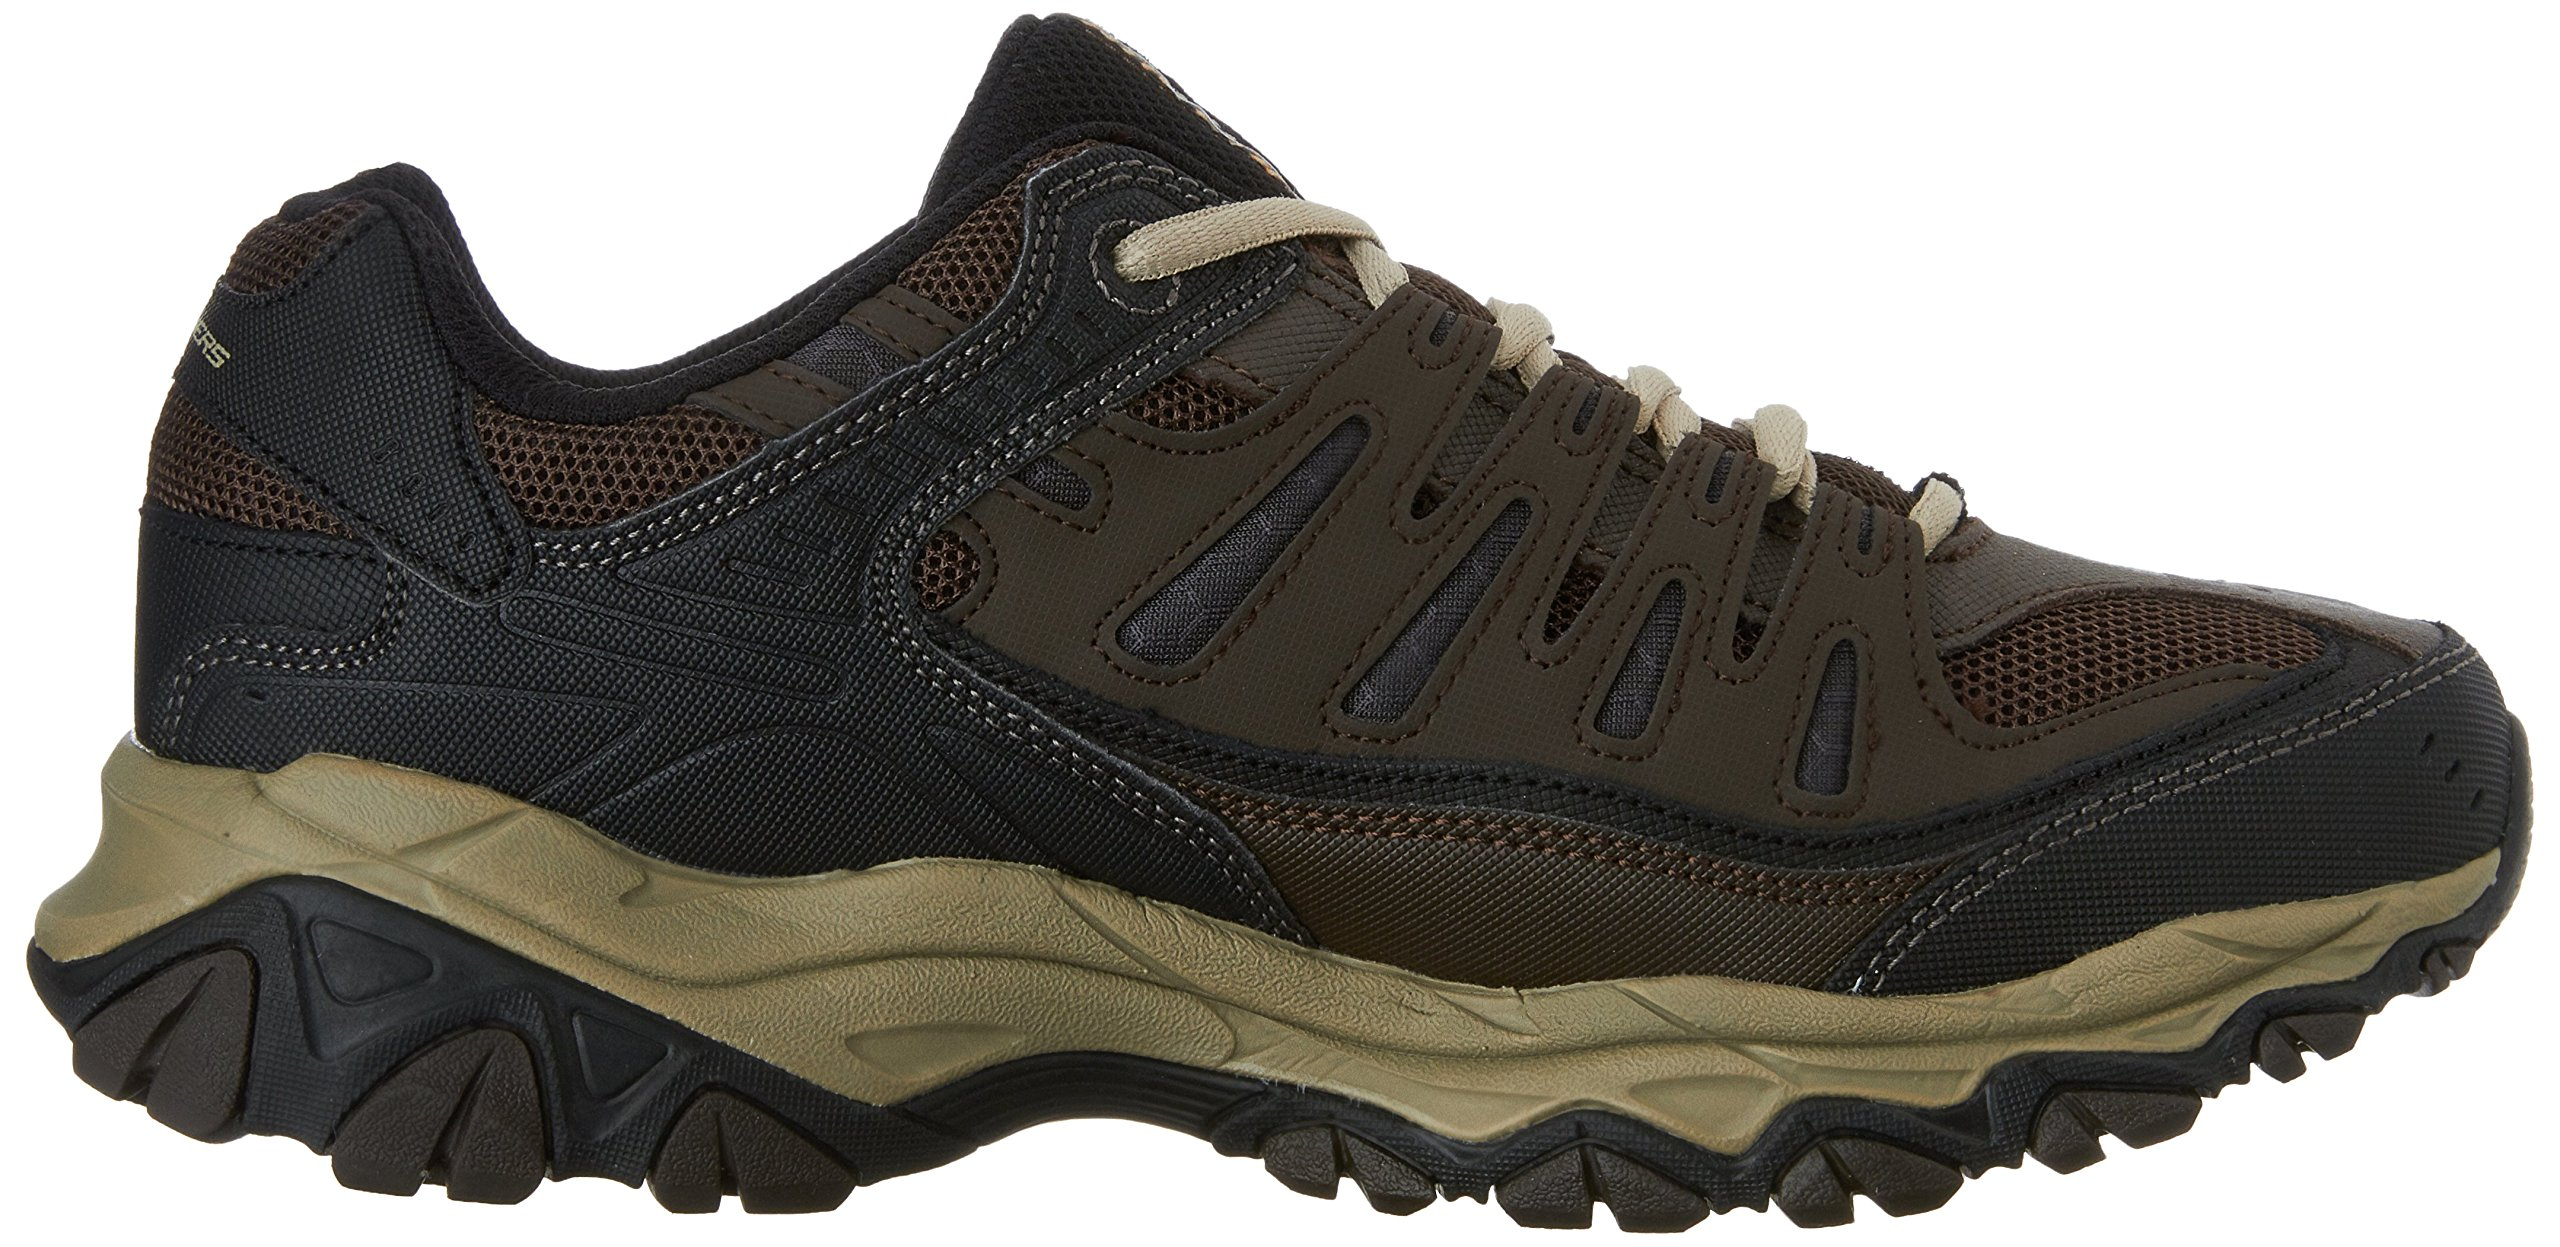 Skechers Men's AFTERBURNM.FIT Memory Foam Lace-Up Sneaker, Brown/Taupe, 7.5 M US by Skechers (Image #7)